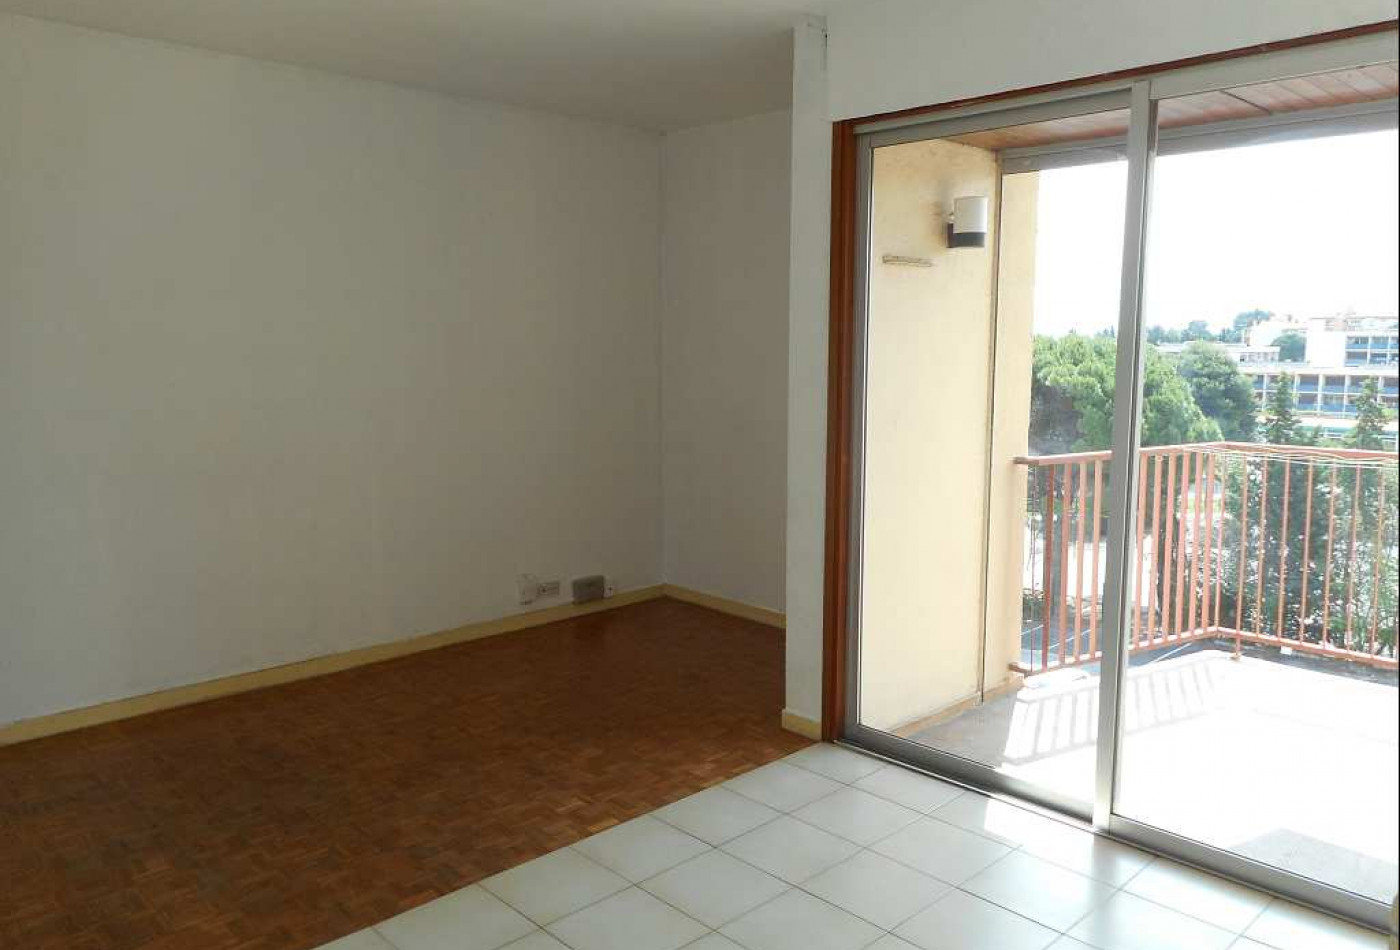 appartement en vente montpellier r f 341681586 frances immobilier. Black Bedroom Furniture Sets. Home Design Ideas